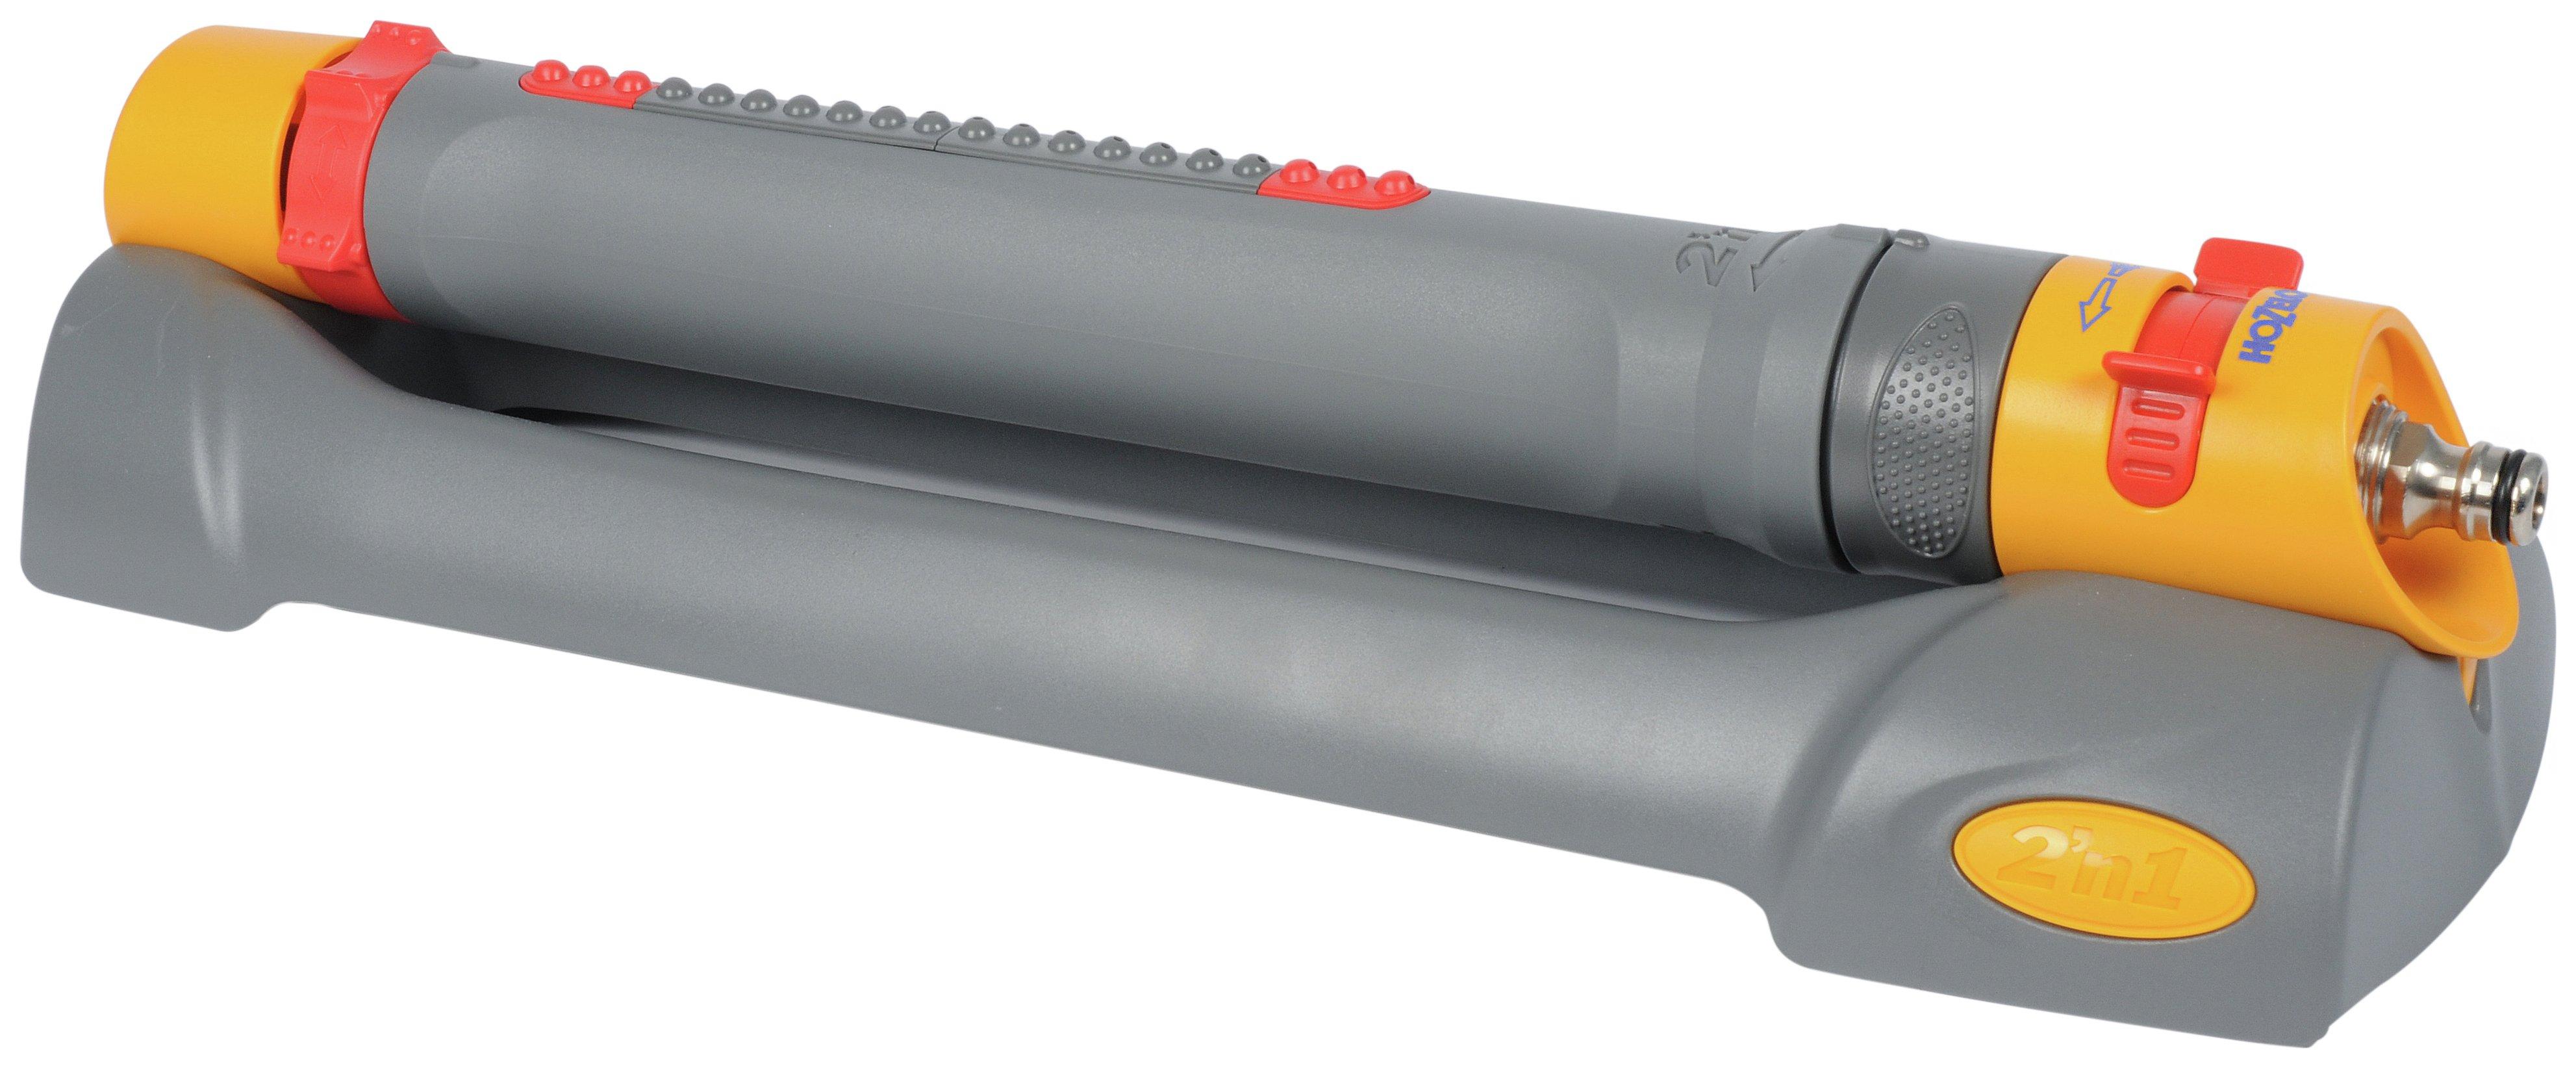 Image of Hozelock Rectangular Sprinkler Pro 320m??.